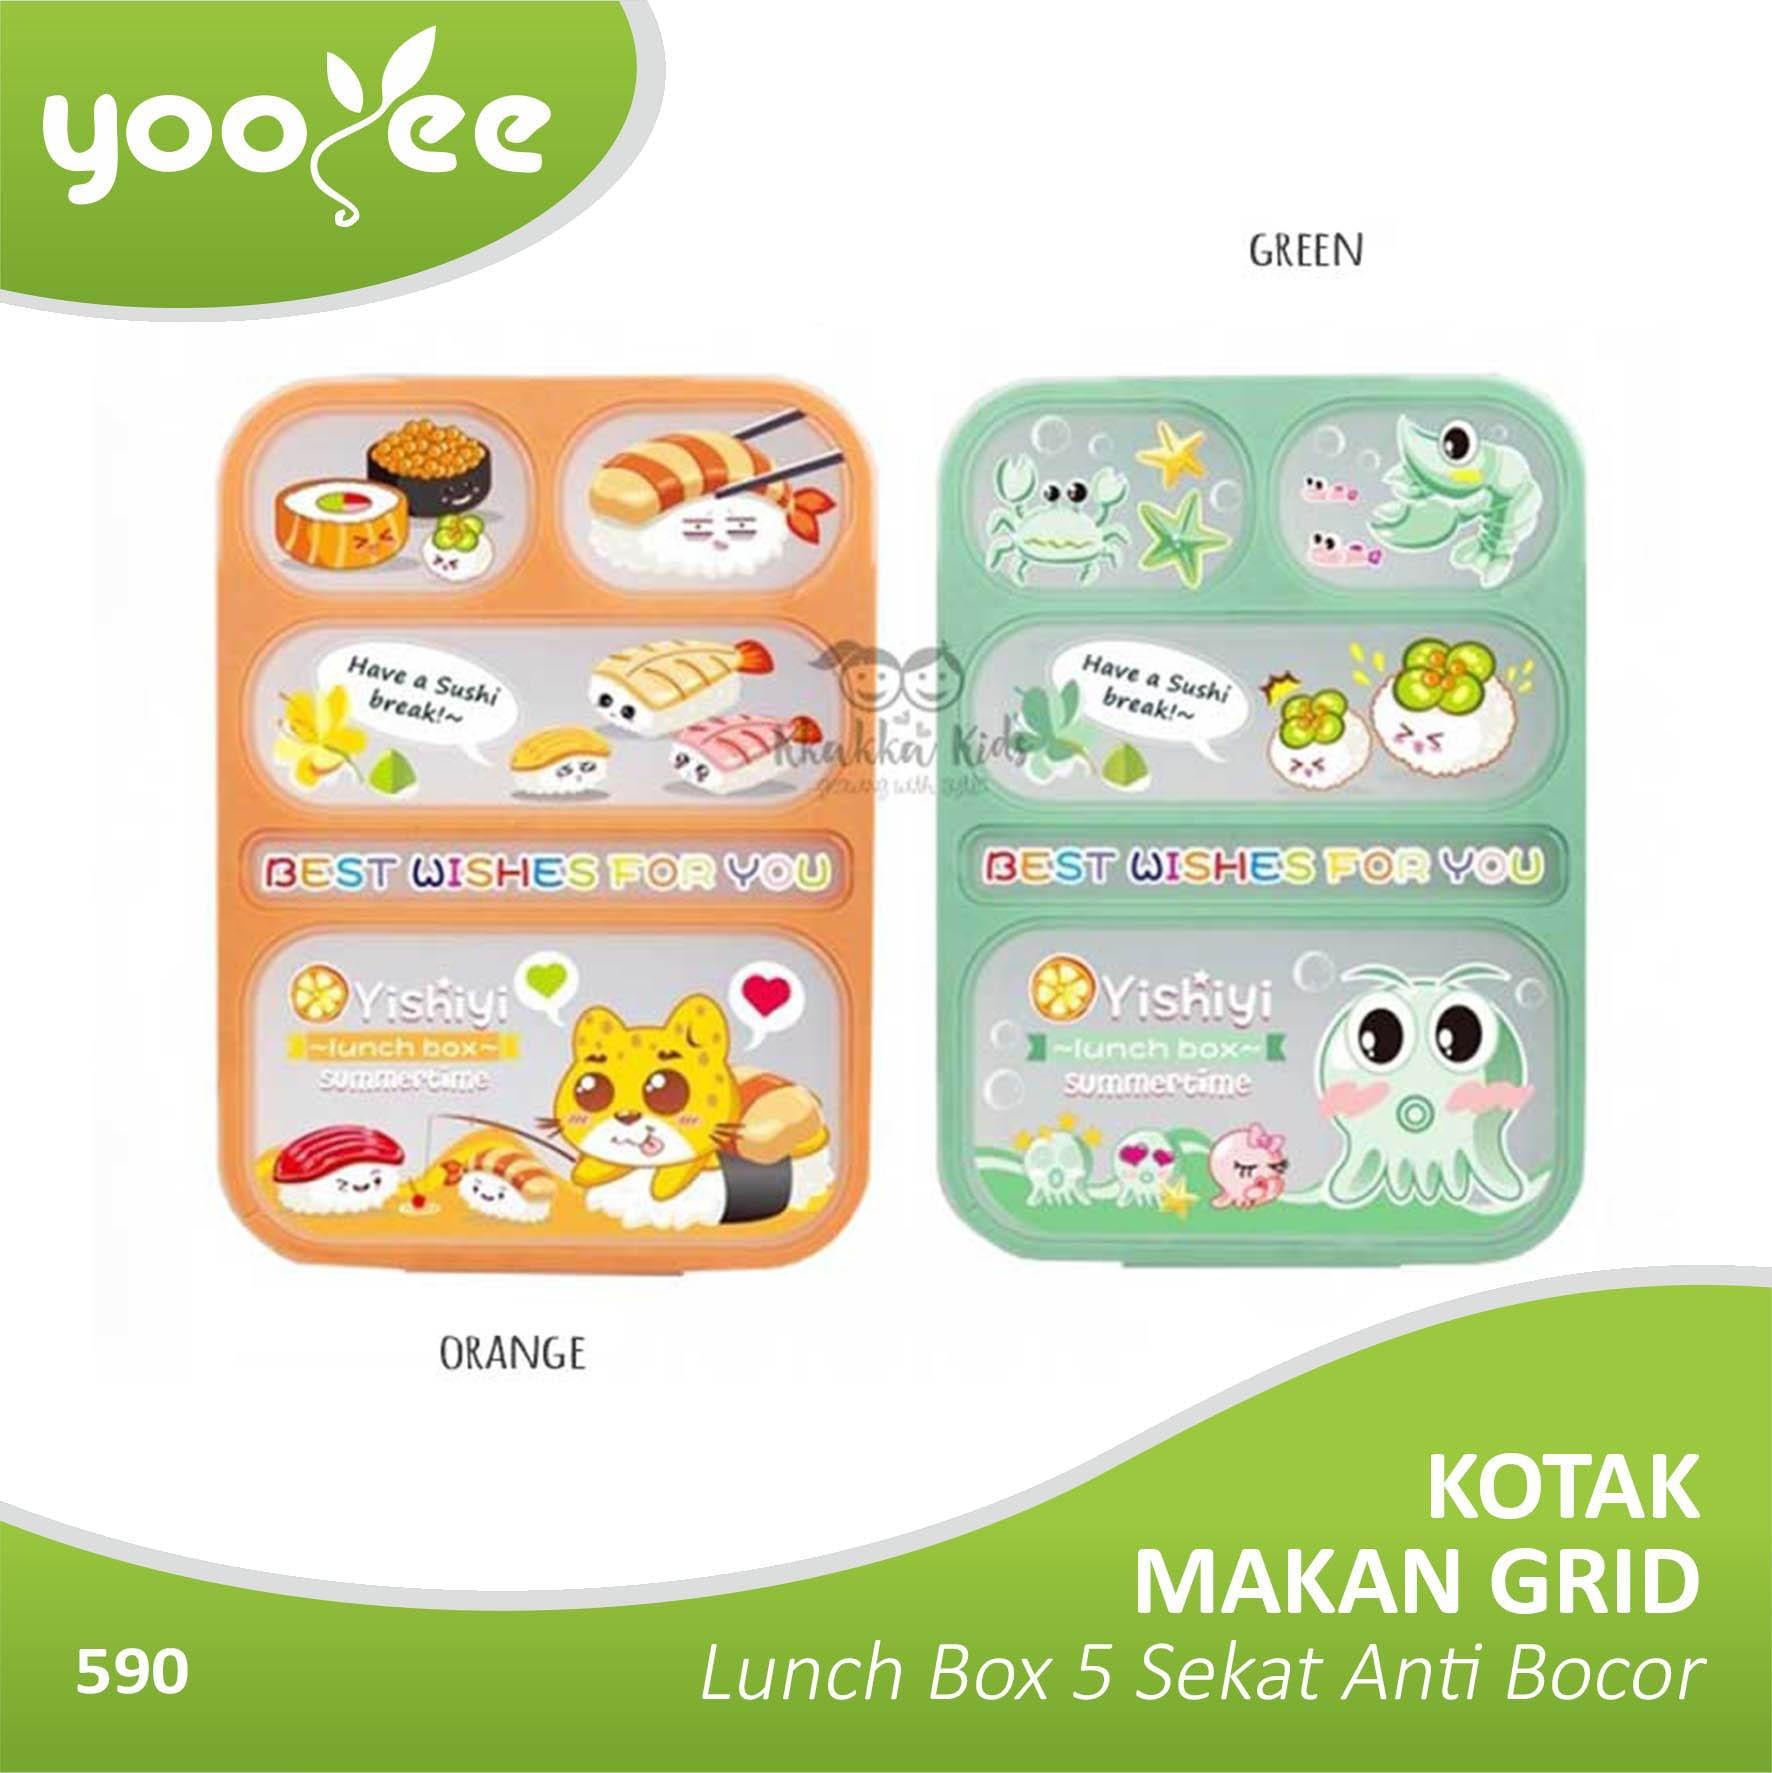 Yooyee Kotak Makan Grid Bento Lunch Box 5 Sekat Anti Bocorleak Proof Kkakkakids Kkakkababy